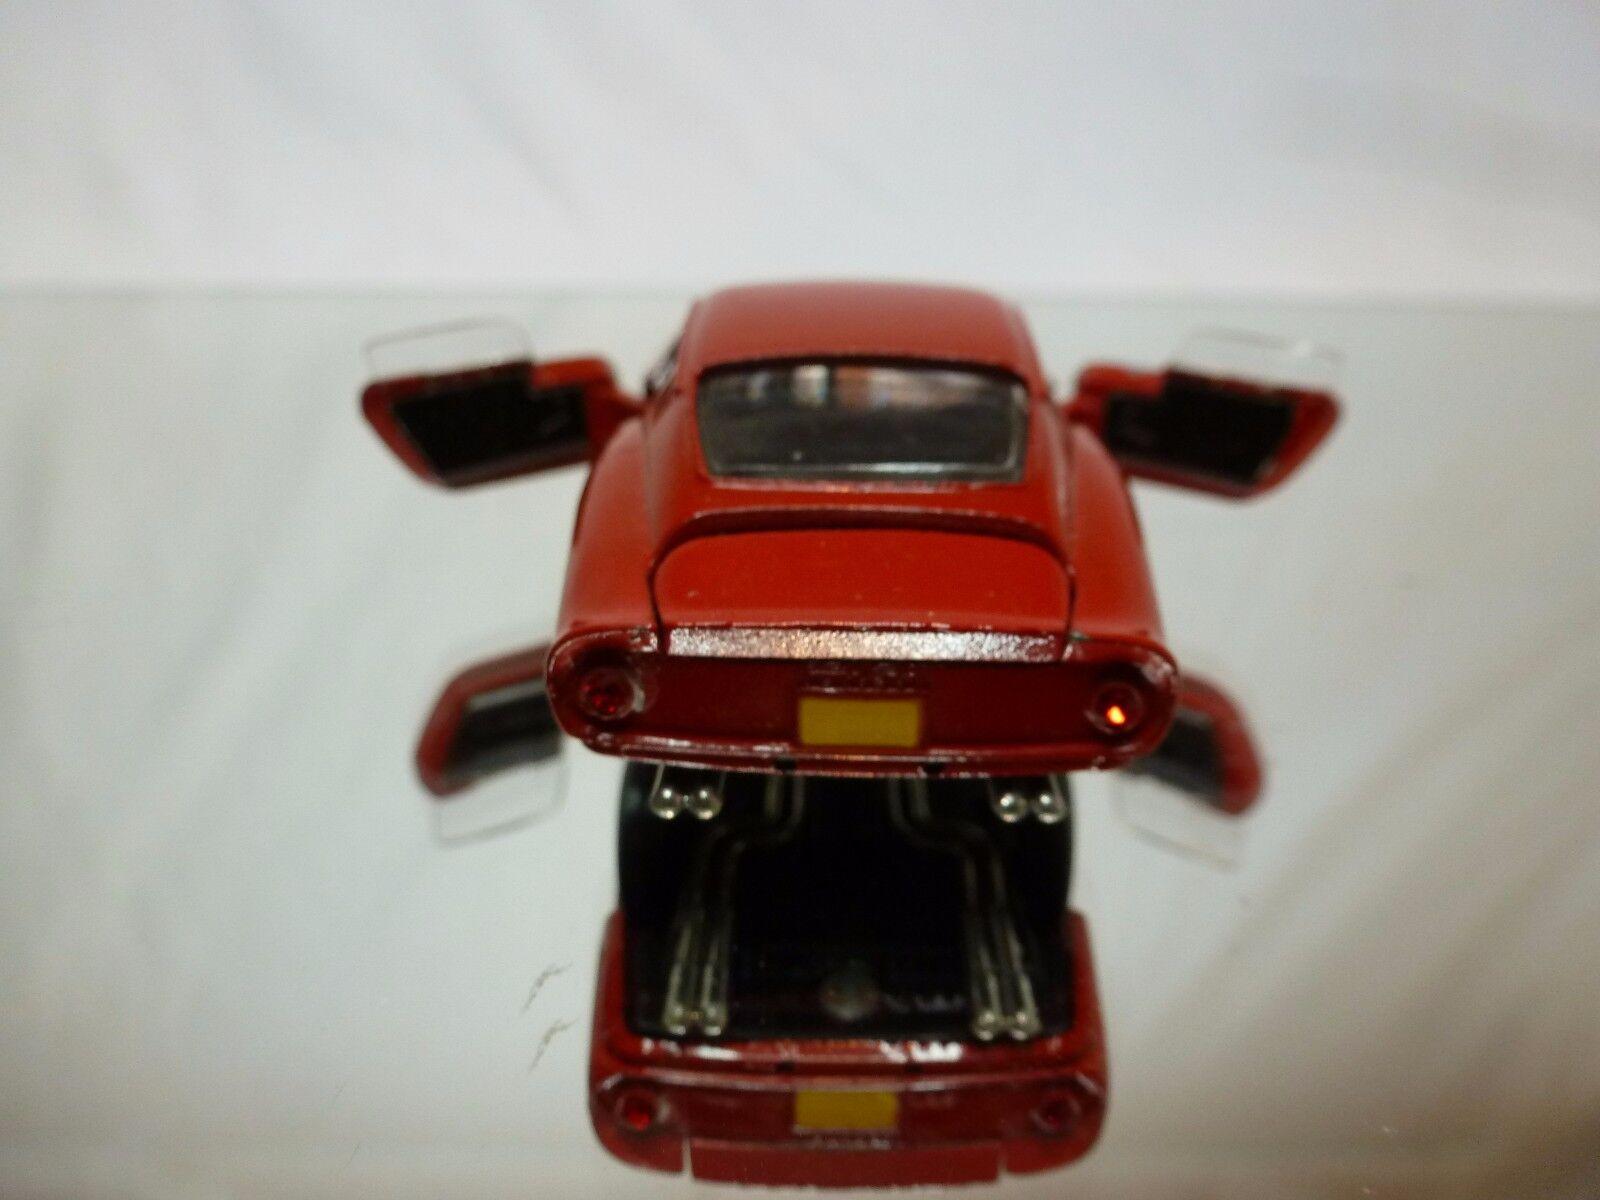 DINKY TOYS 506 - FERRARI 275 GTB - - - RED 1 43  - GOOD CONDITION 8bce21